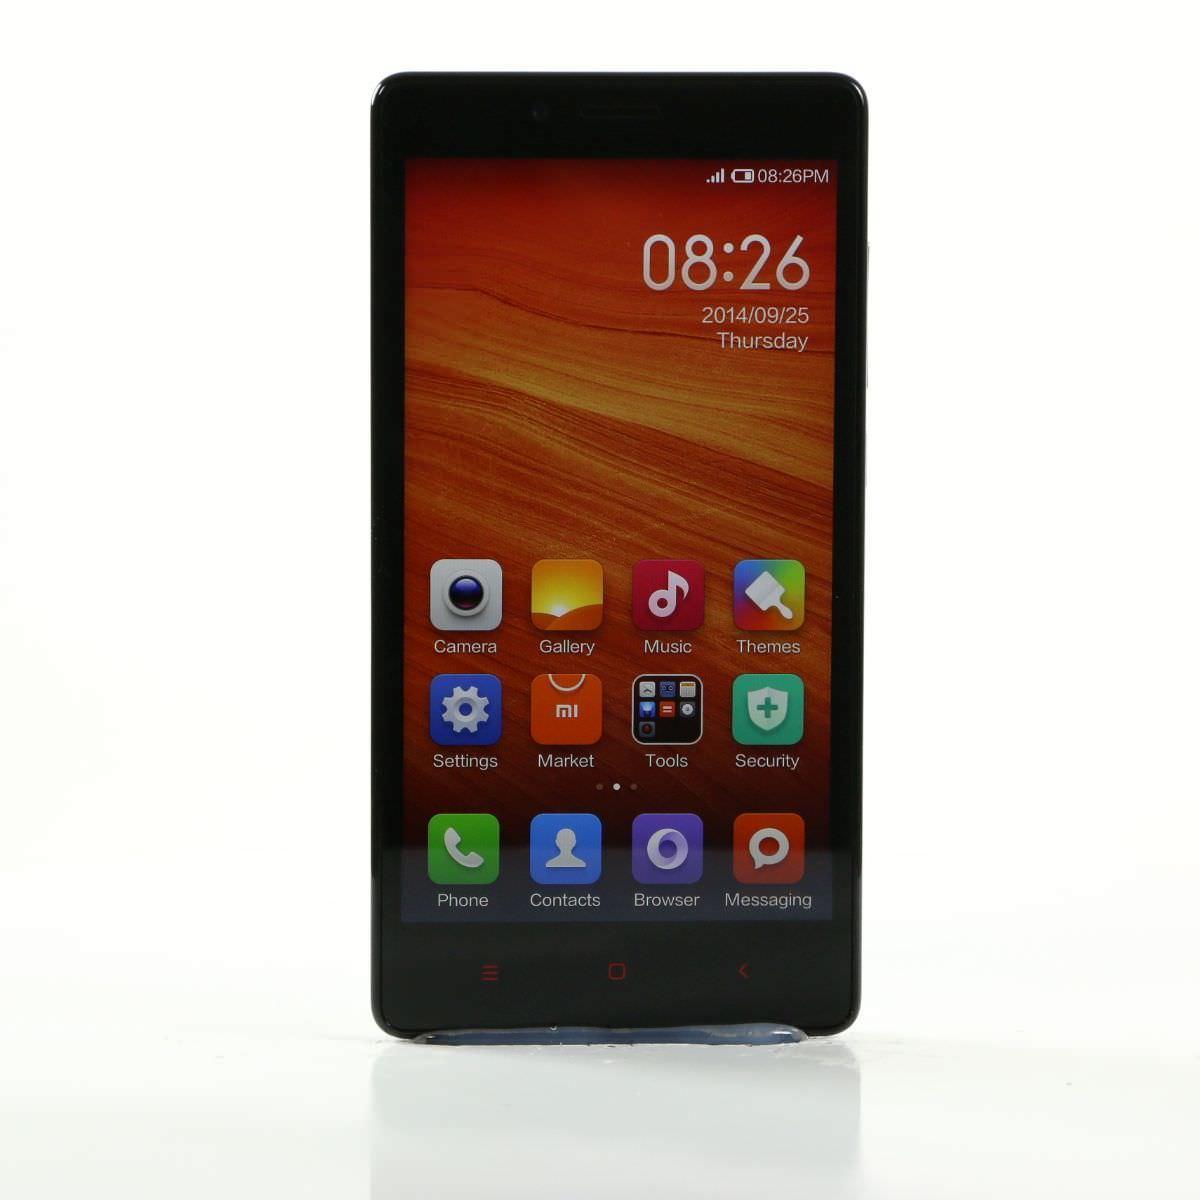 Redmi Note 4G Degree View